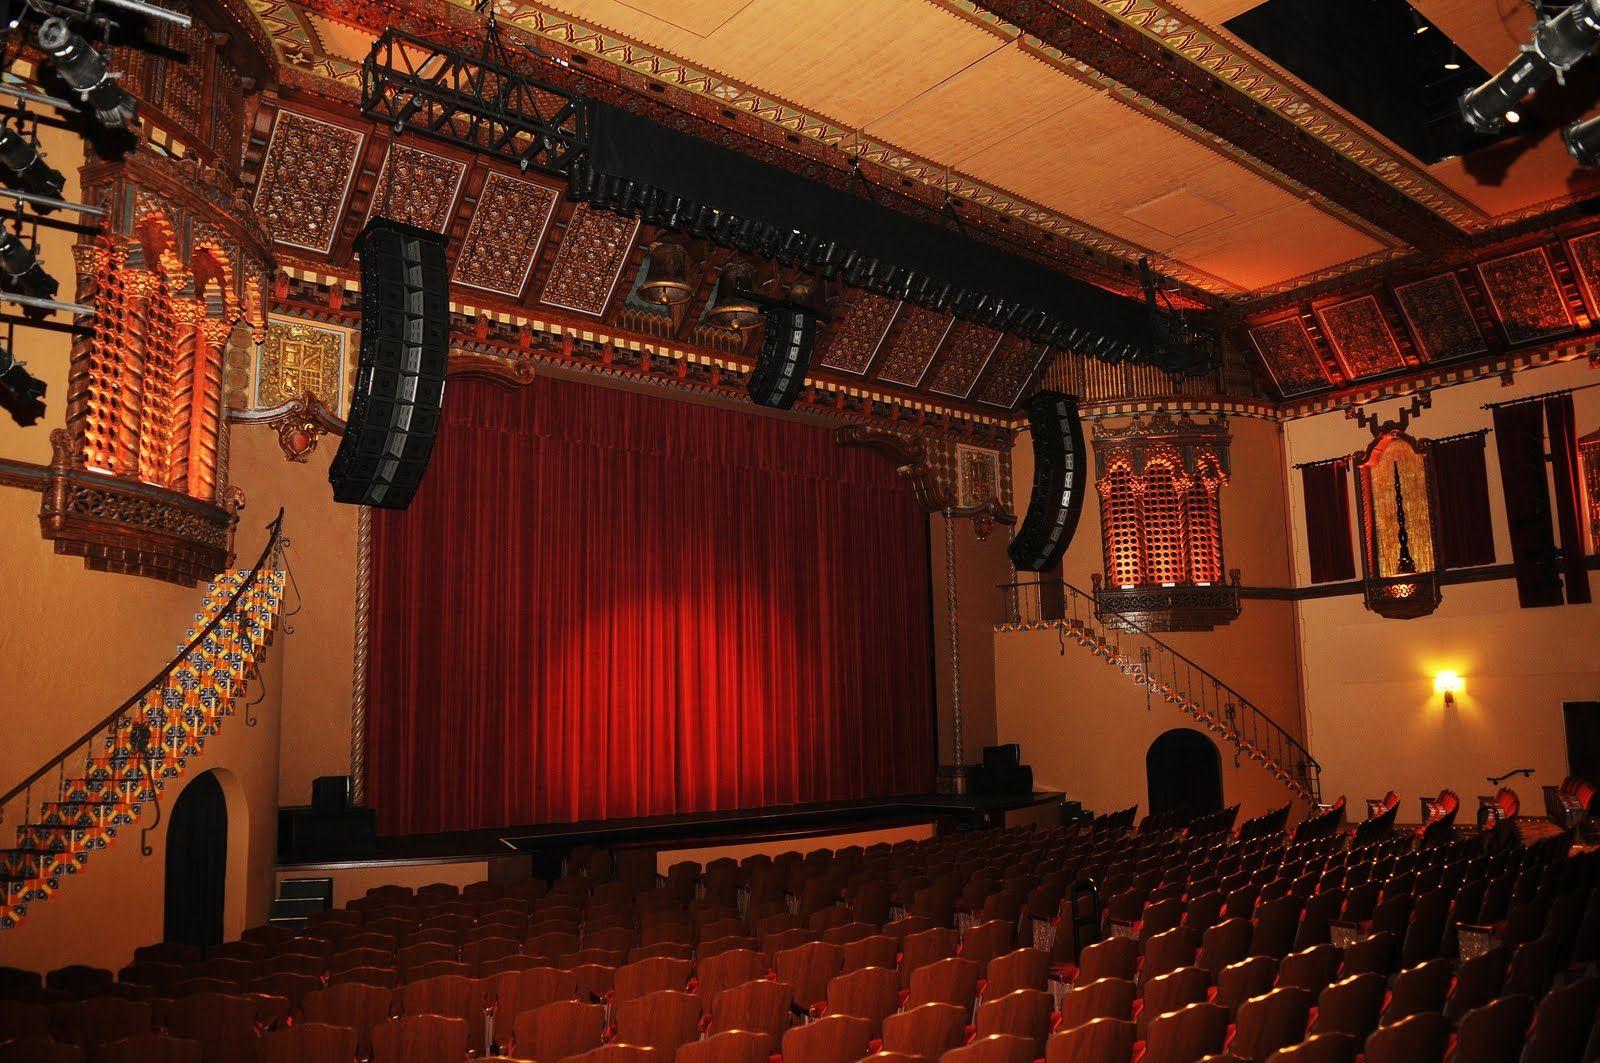 Westbury Theater Seating Chart Di 2020